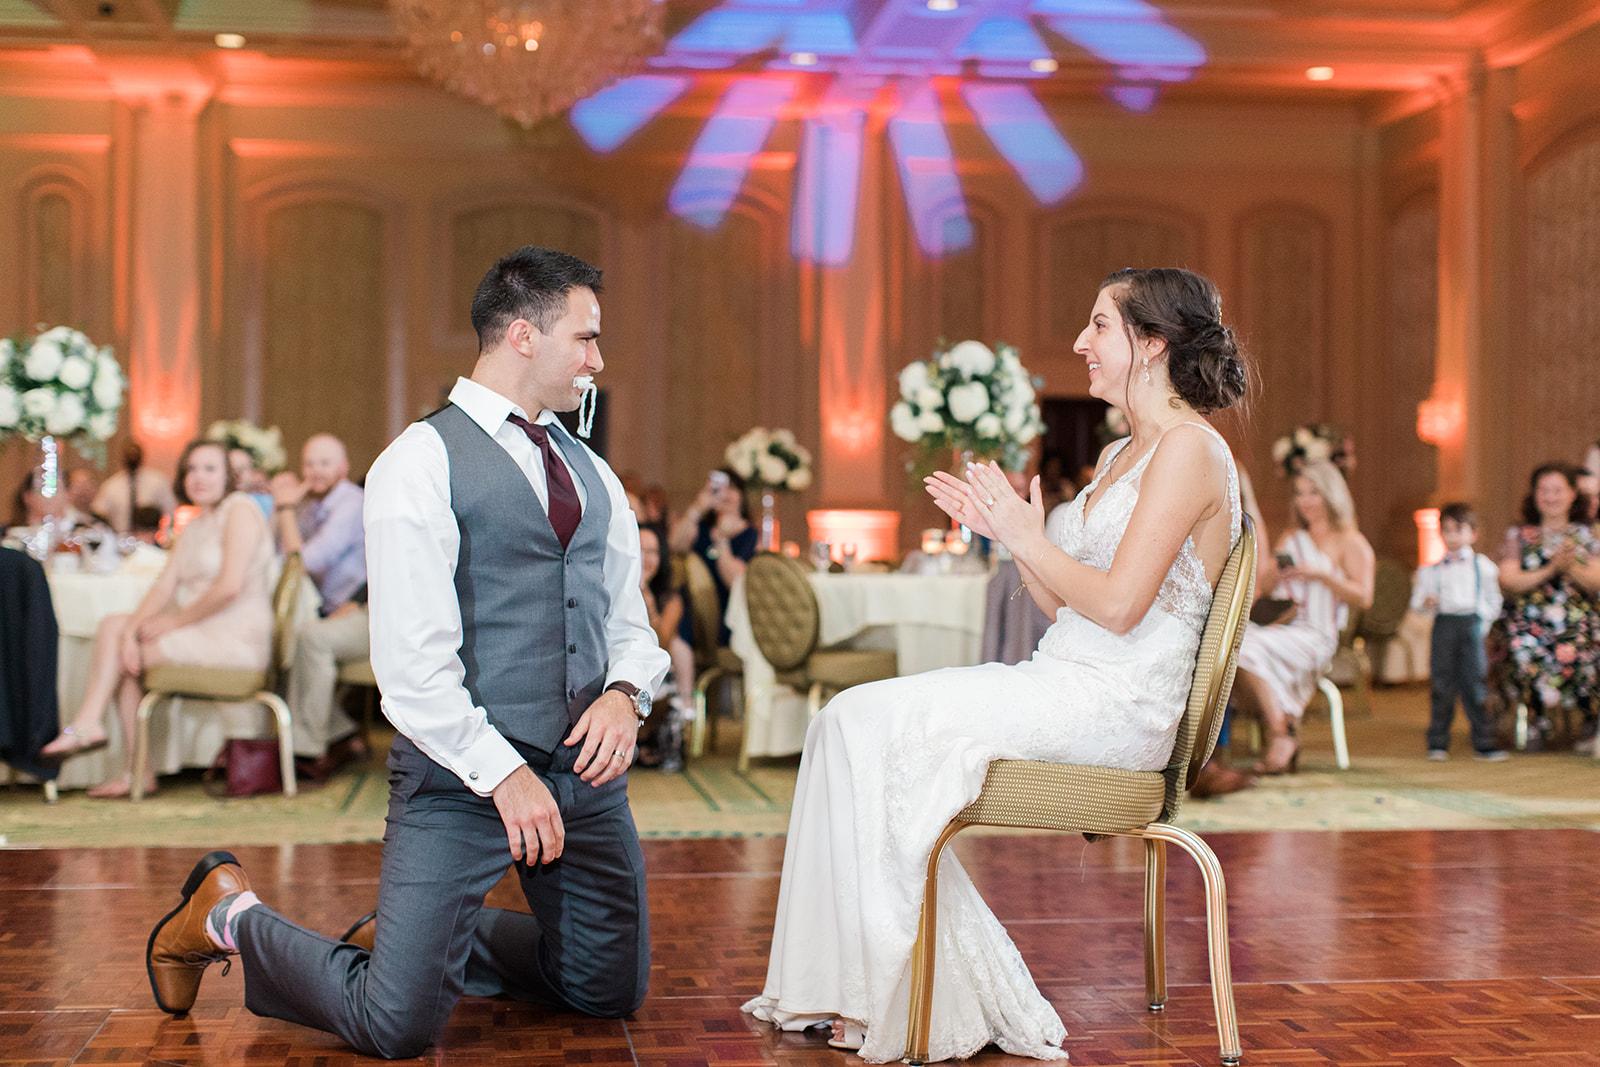 4270ef28 Evi & Chris's Wedding at Prestonwood Country Club by Bowtie Collaborative